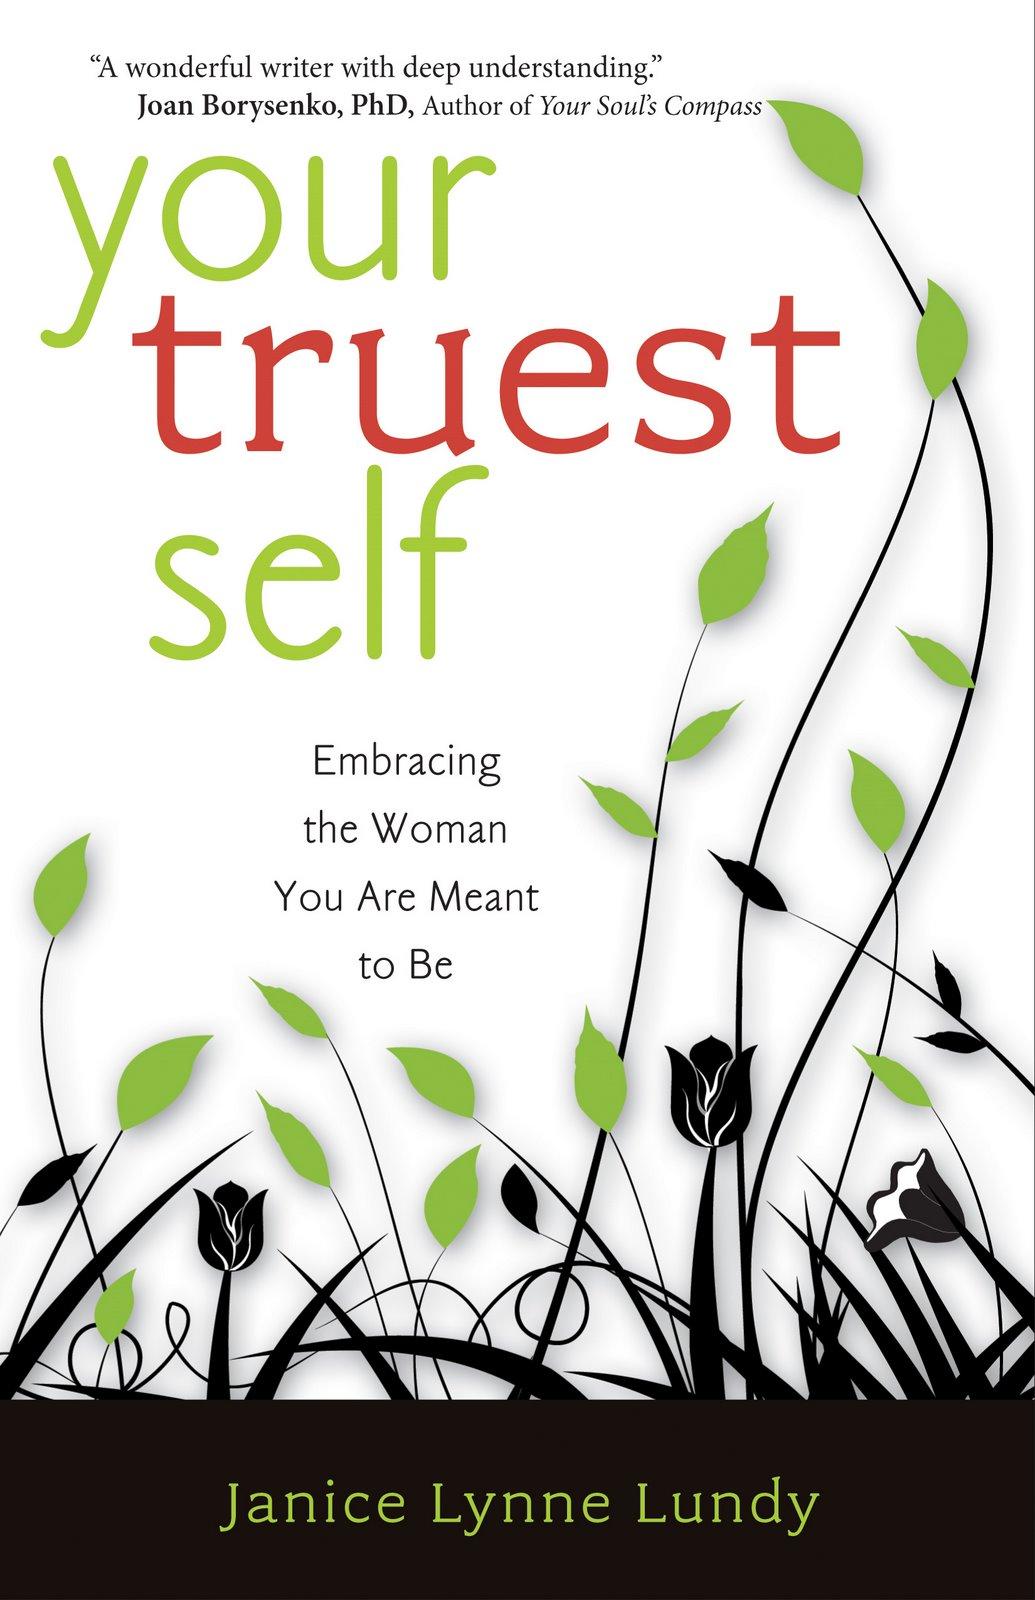 [your+truest+self+cover.jpg]